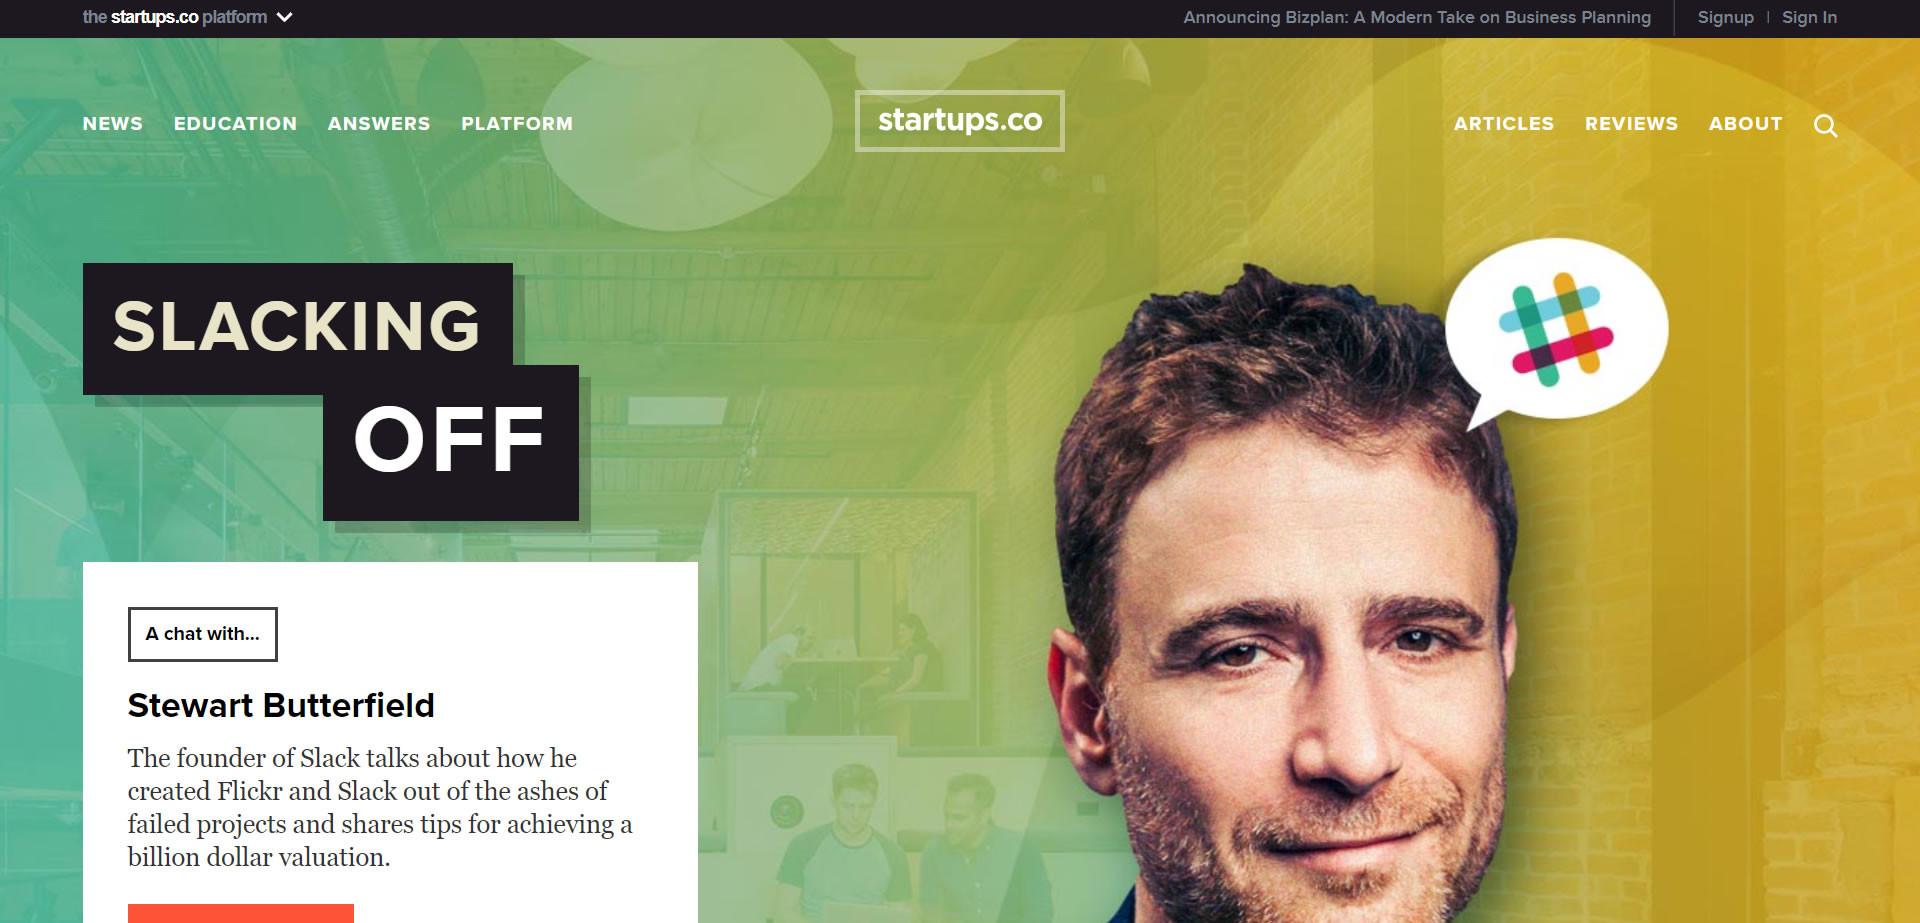 Startups.co